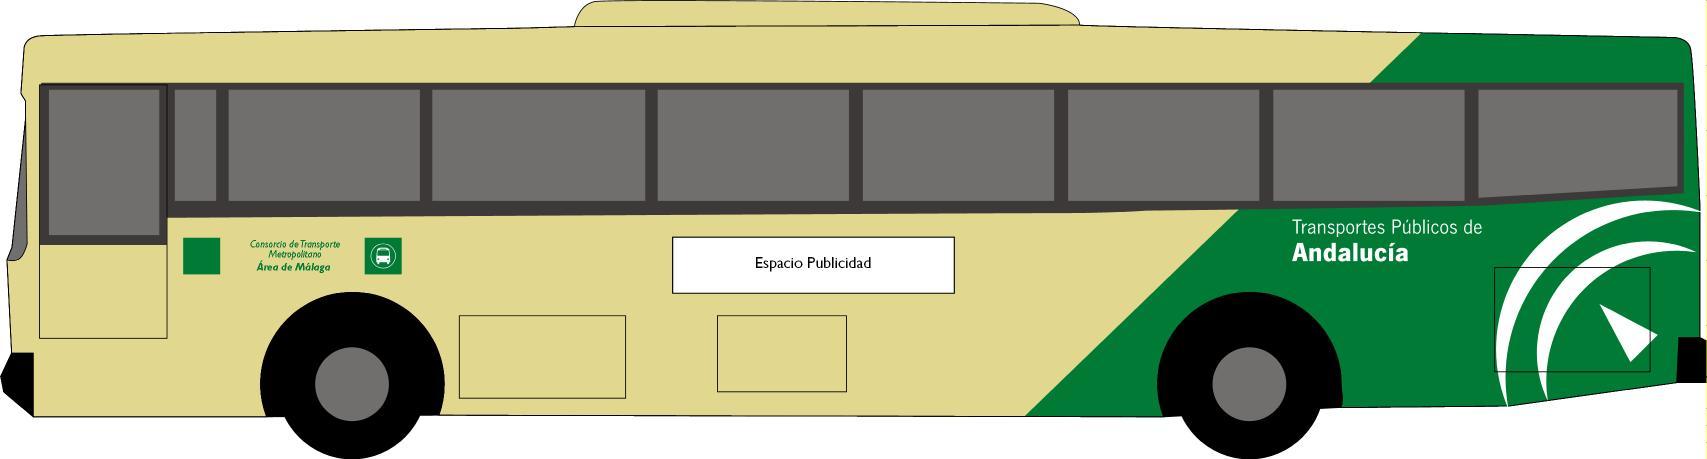 Autobús: lateral izquierdo